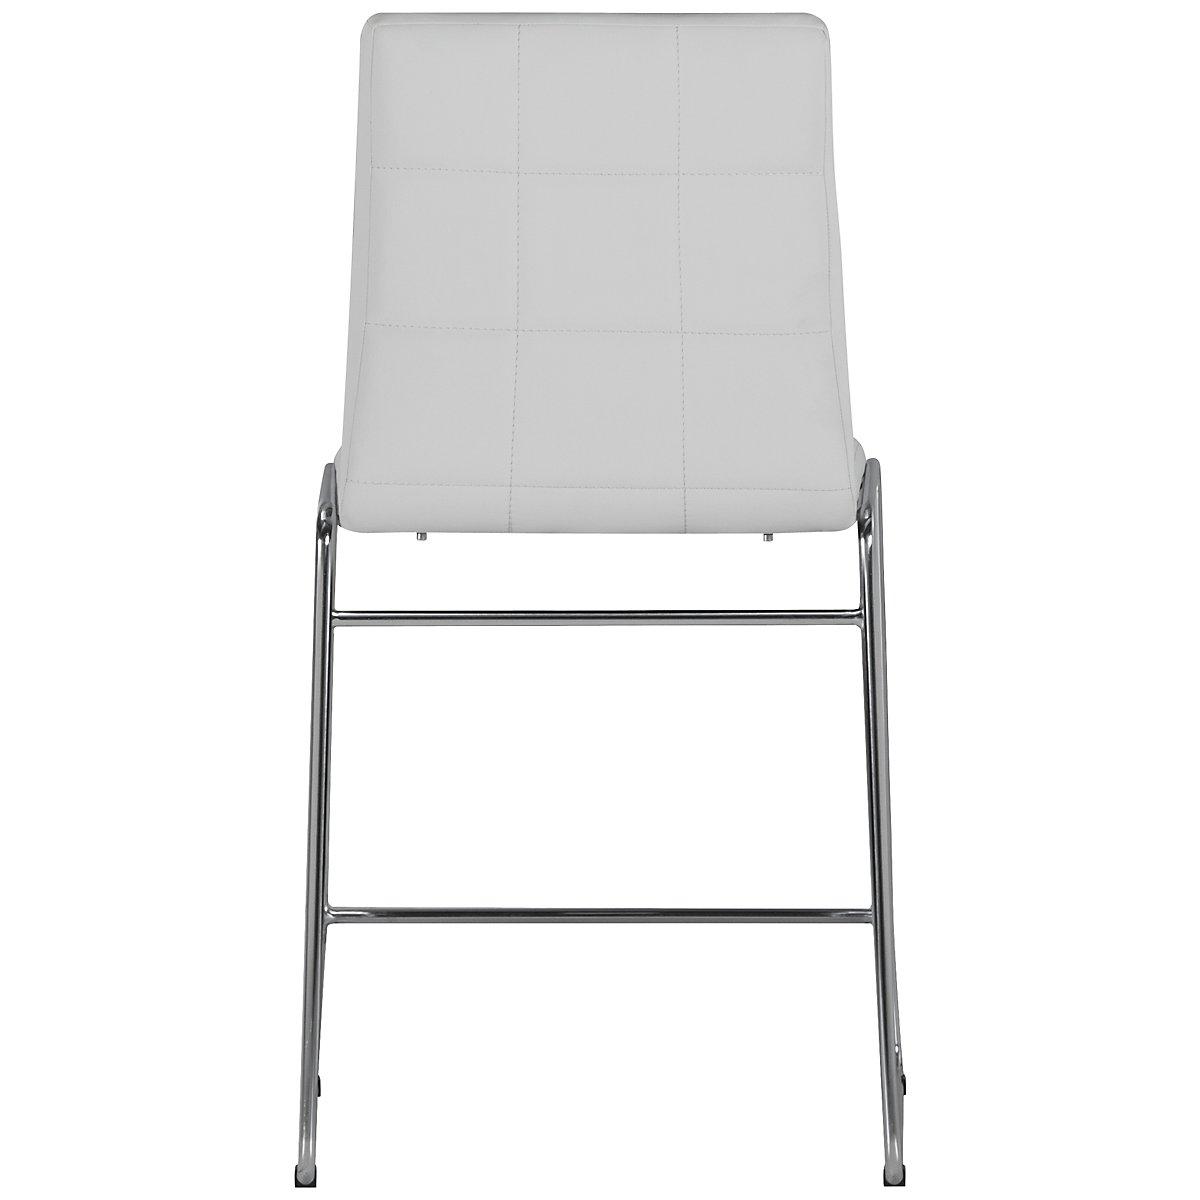 Napoli White Round High Table amp 4 Upholstered Barstools